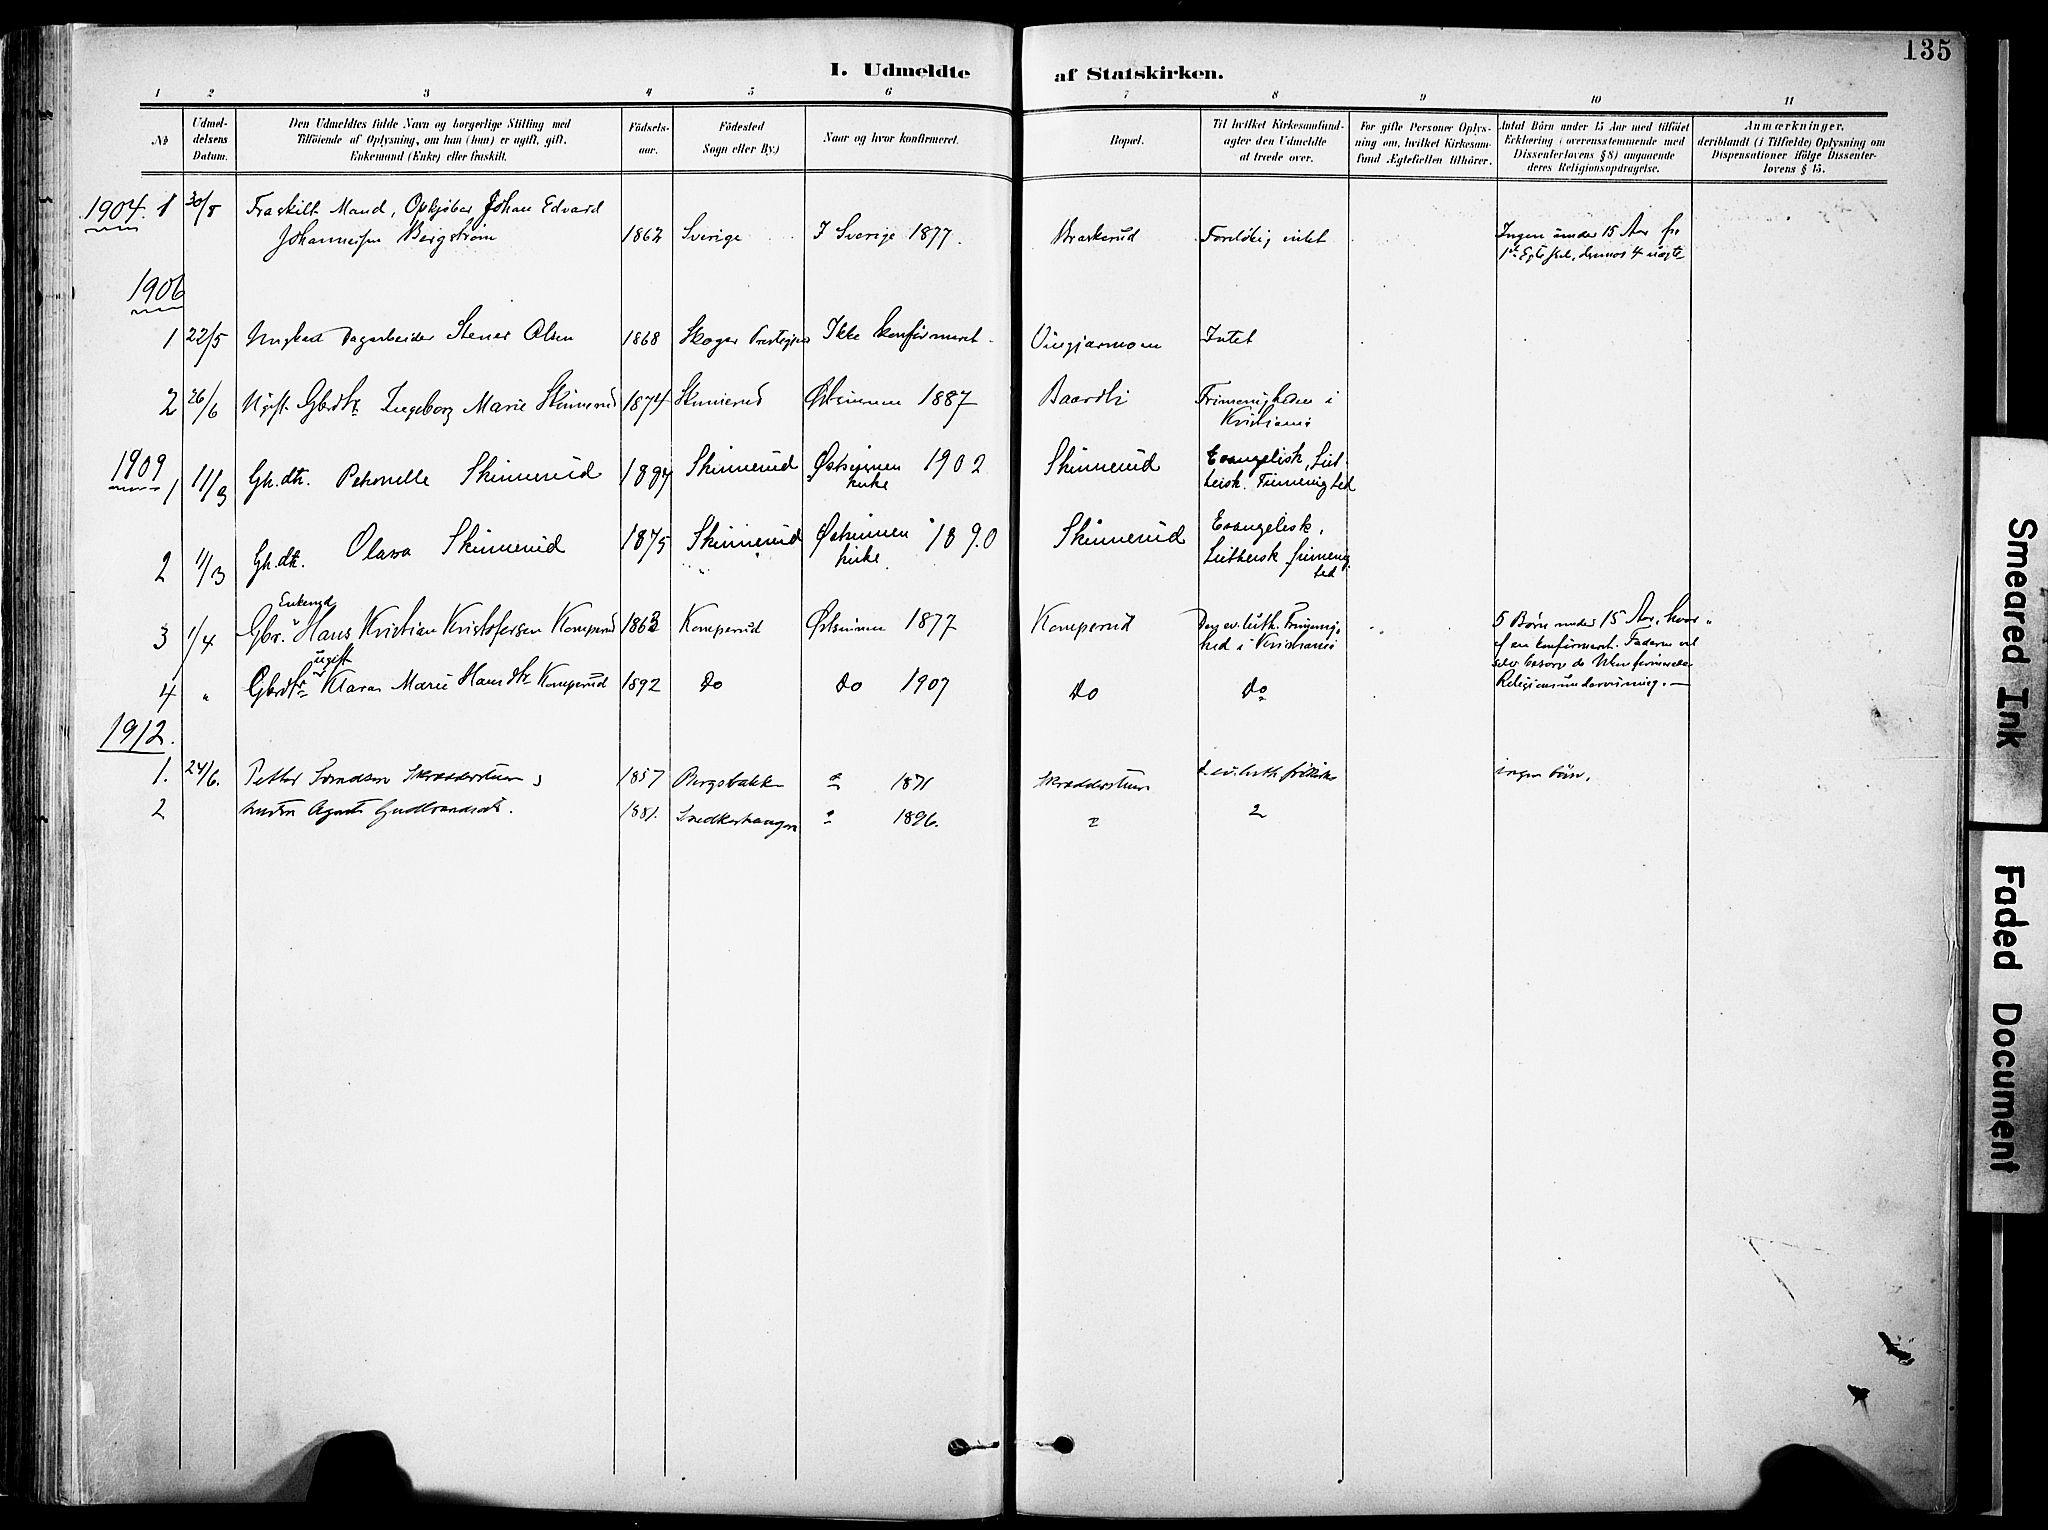 SAH, Nordre Land prestekontor, Ministerialbok nr. 6, 1897-1914, s. 135